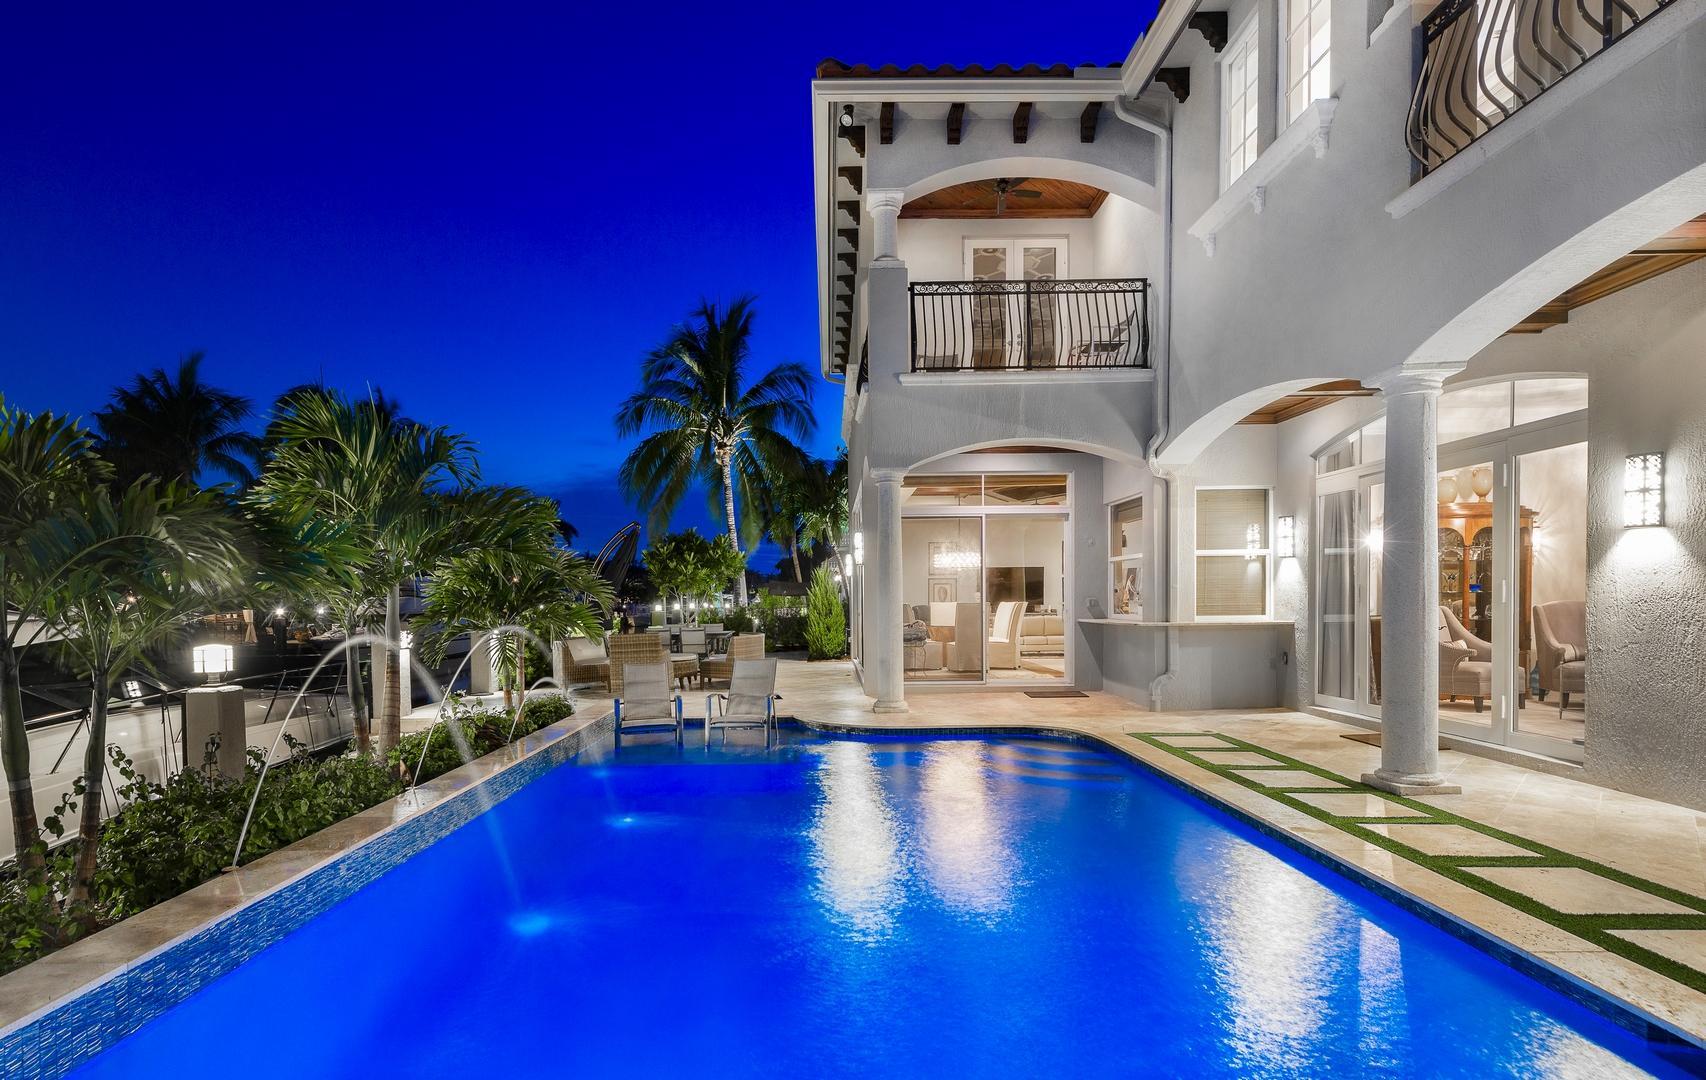 830 NE 70th Street Boca Raton FL 33487